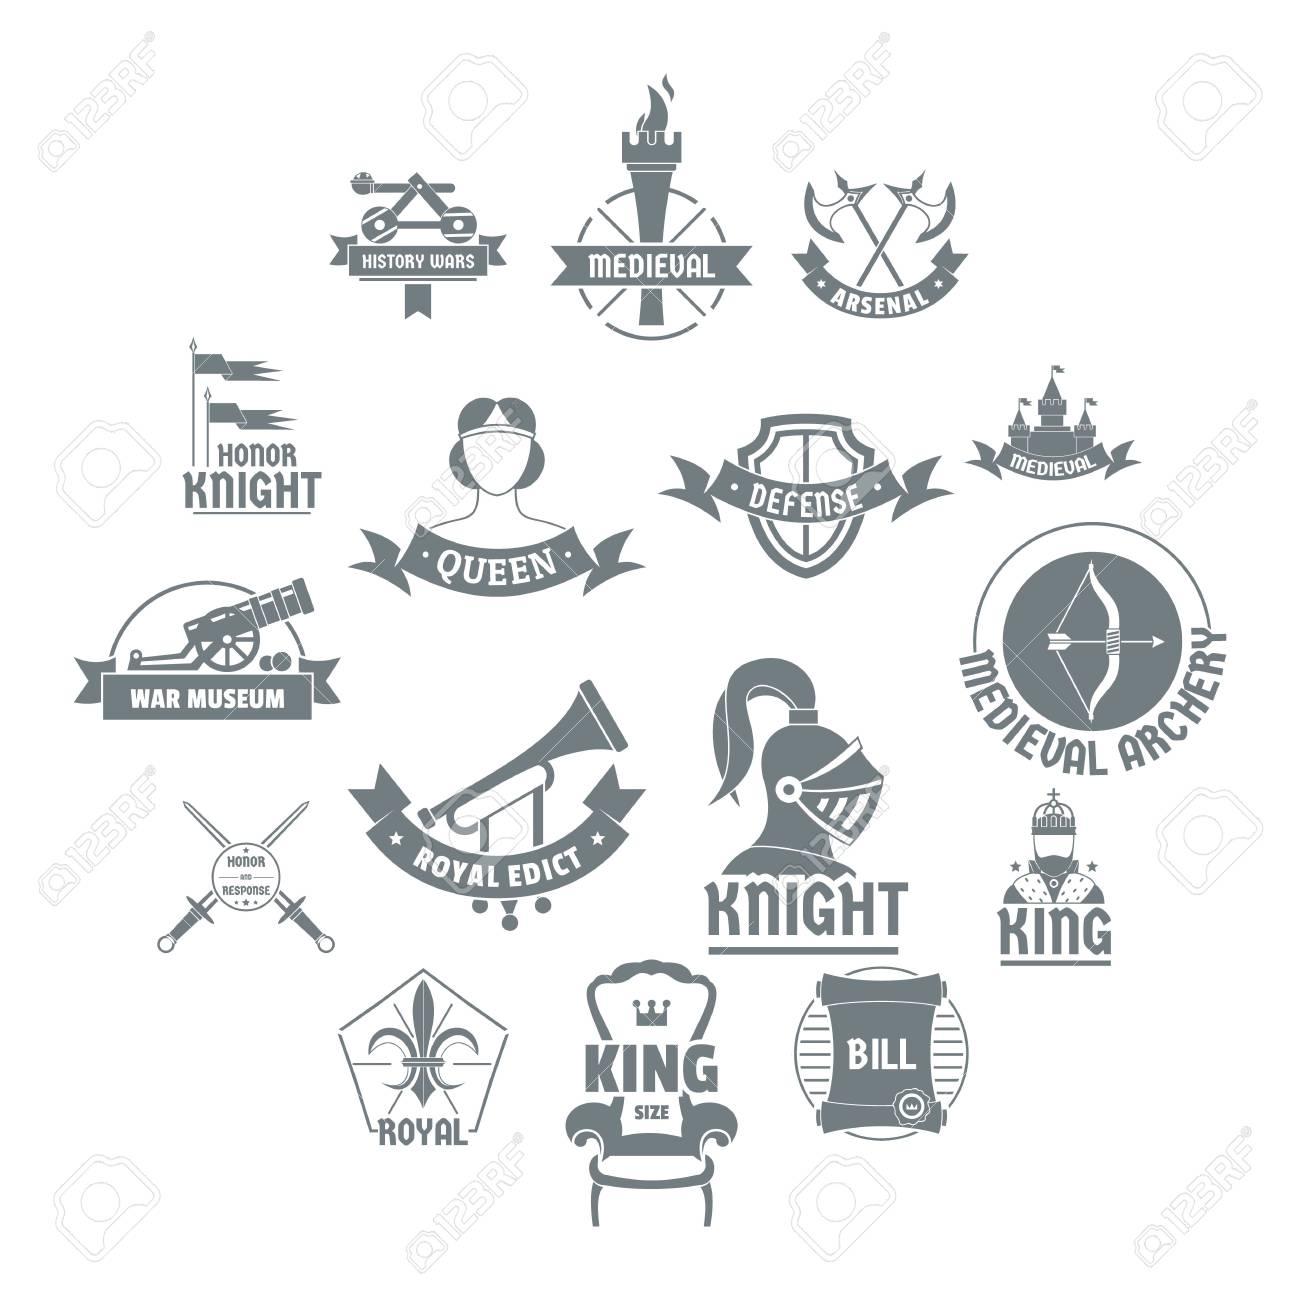 knight medieval logo icons set simple illustration of 16 knight